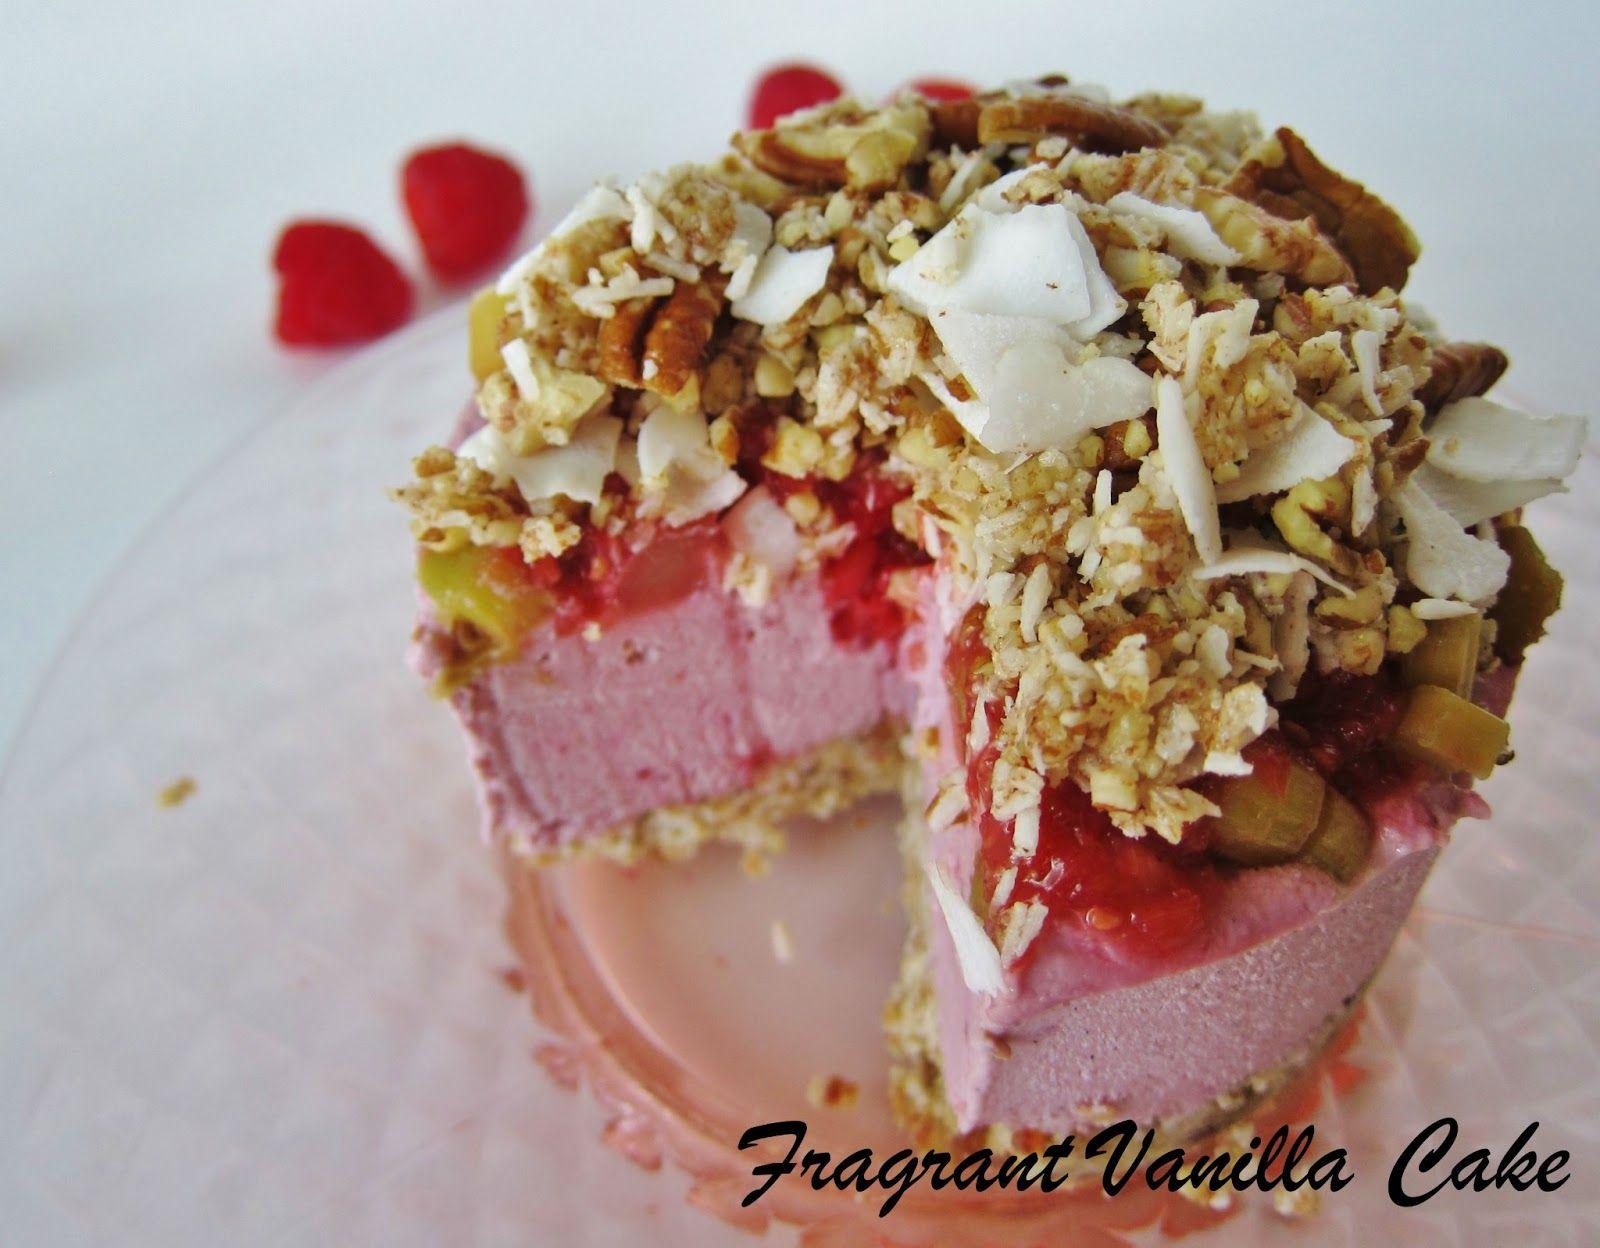 Raspberry Rhubarb Streusel Topped Cheesecakes